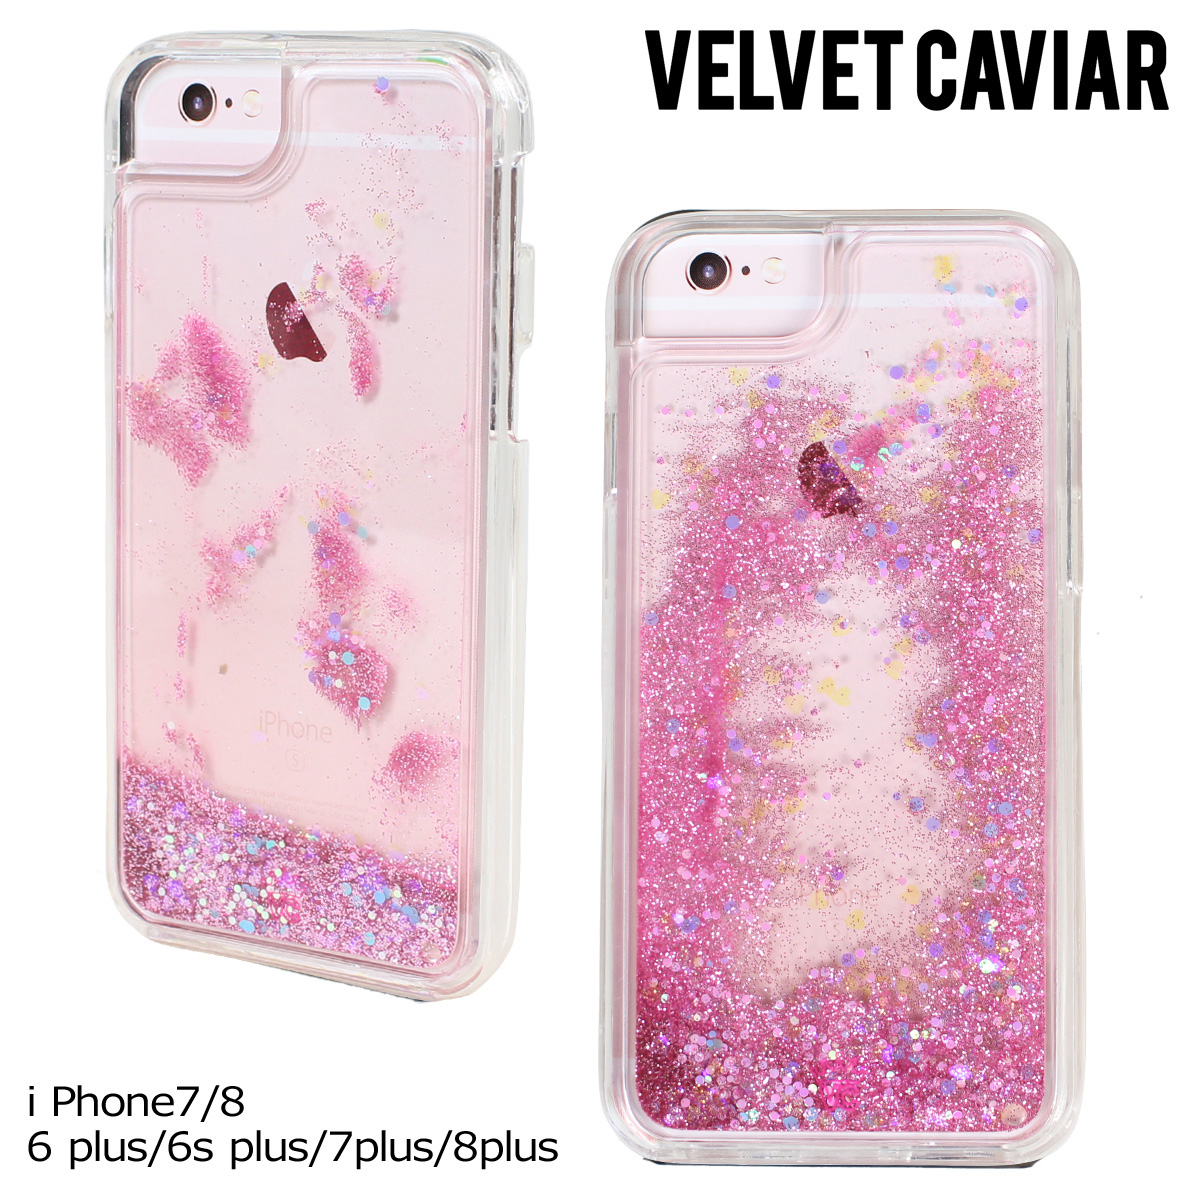 more photos c7915 6dd8b Velvet Caviar PINK HOLOGRAPHIC GLITTER IPHONE CASE velvet caviar iPhone8 7  Plus 6s six cases smartphone iPhone case glitter eyephone iPhone velvet ...